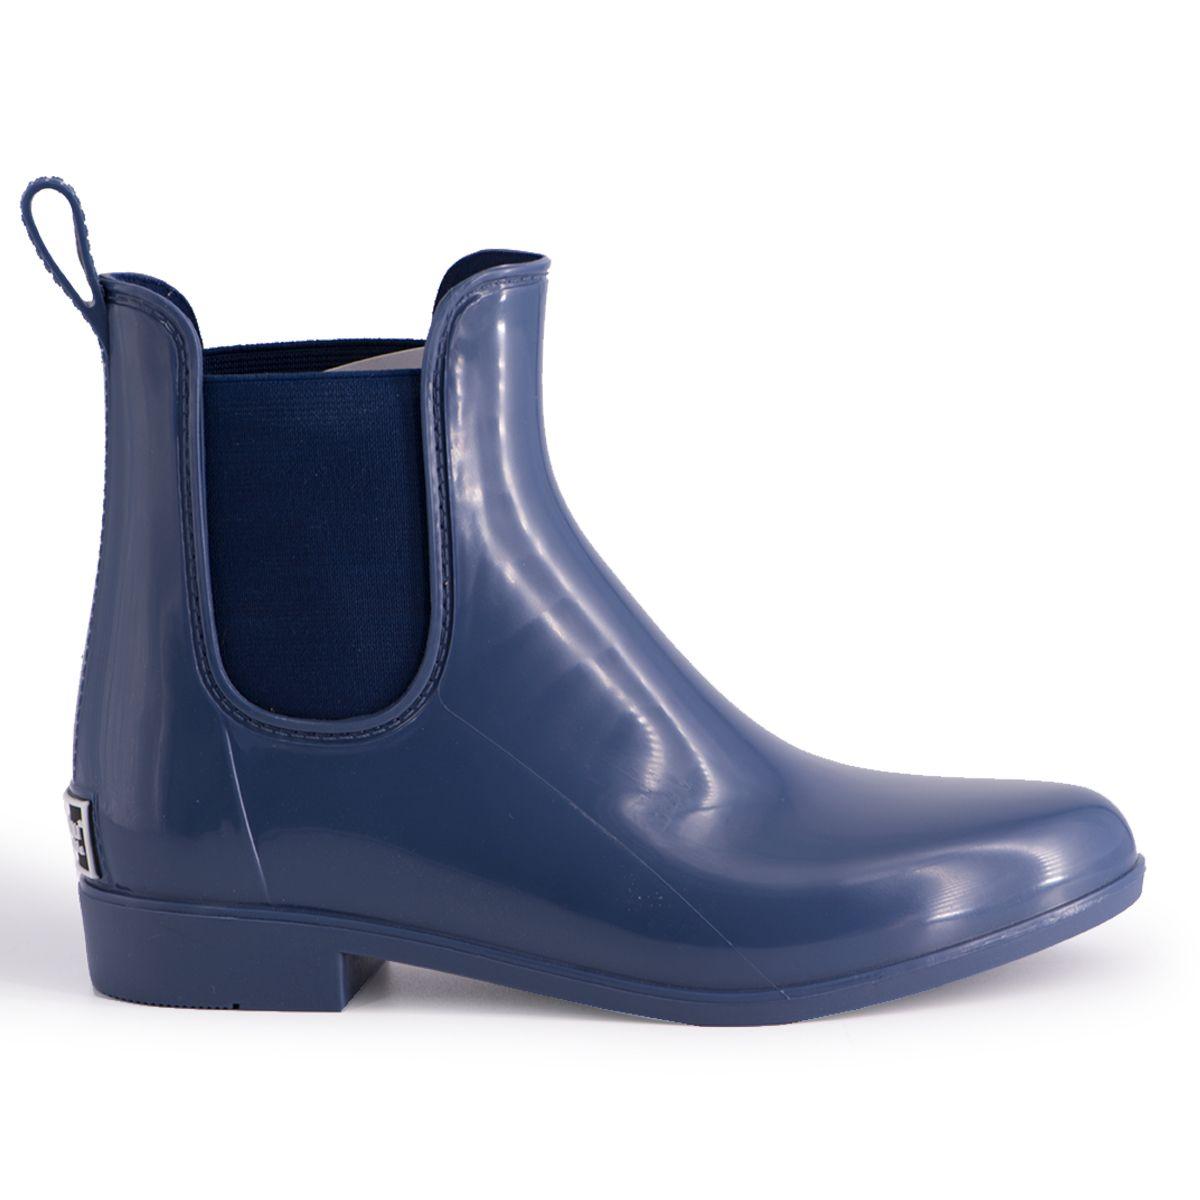 Aus Wooli Australia Womens Rainboots With Sheepskin Insole Included NAVY